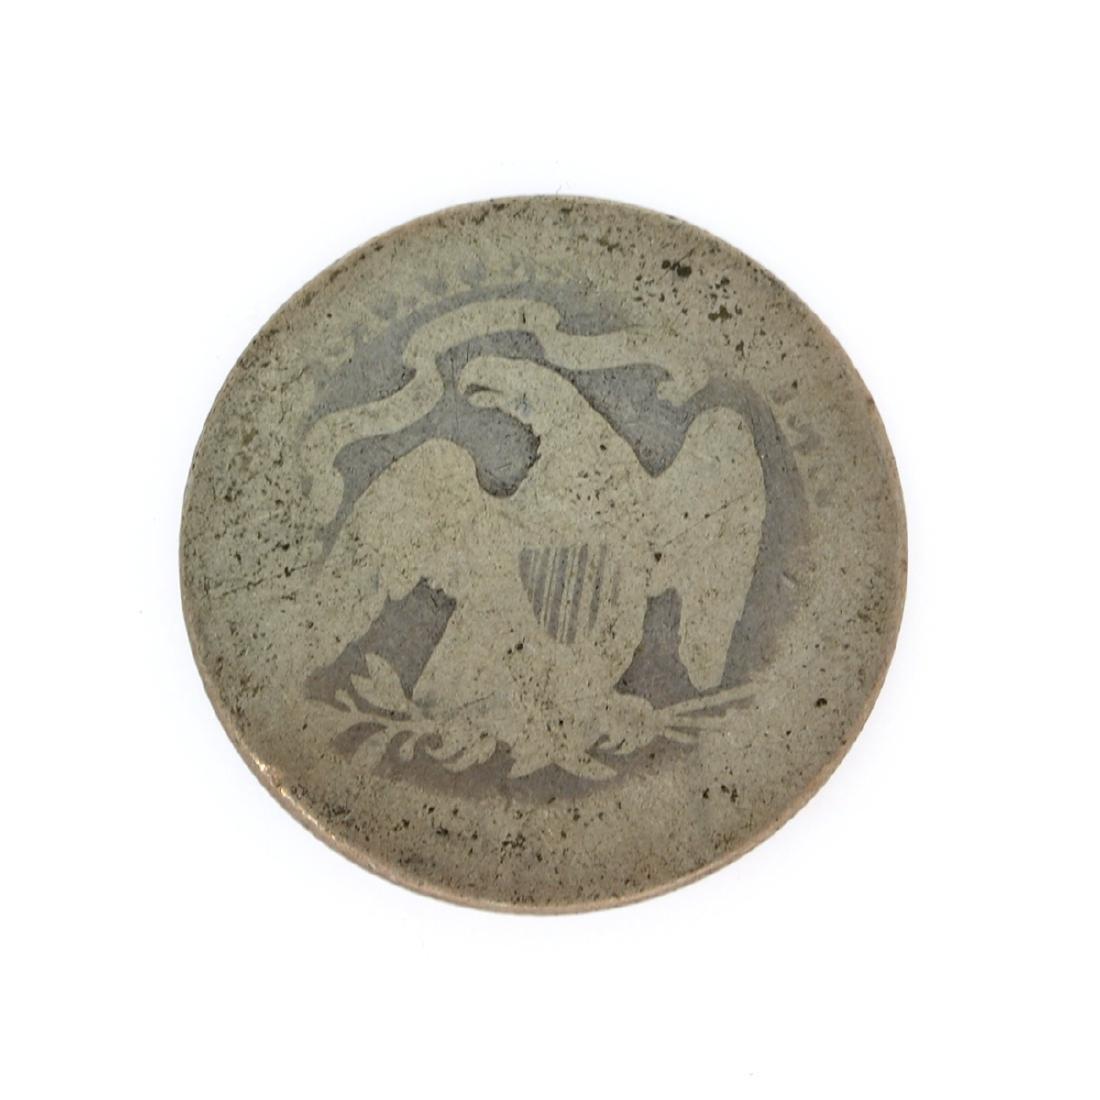 Rare 1875 Liberty Seated Quarter Dollar Coin - 2